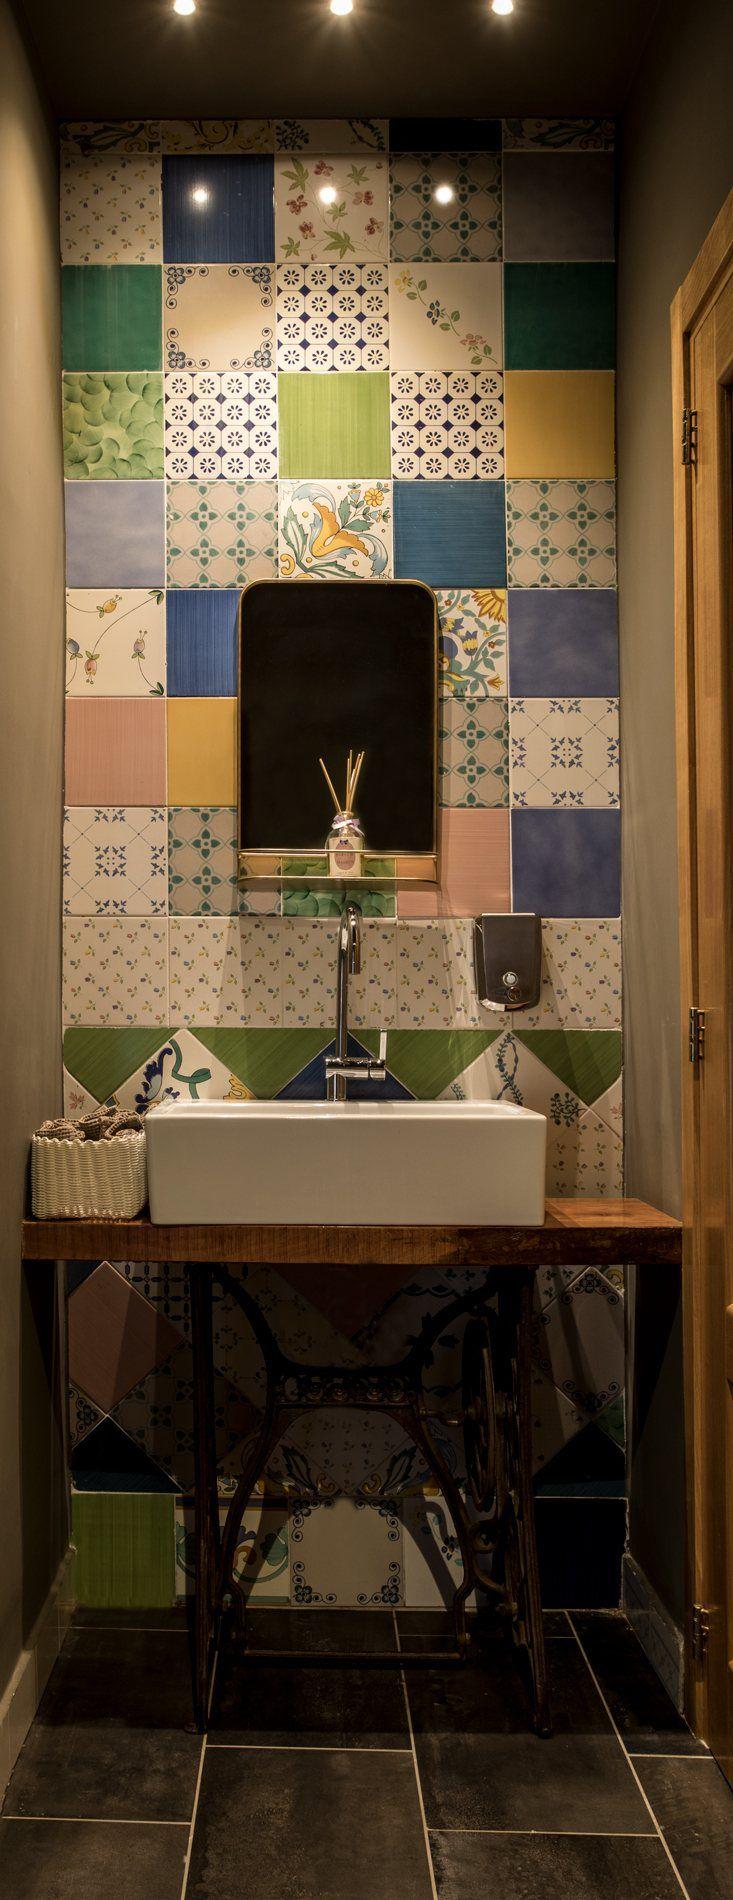 Bradoburger, Pomigliano d'Arco, 2017 - Bilo Dunk Studio